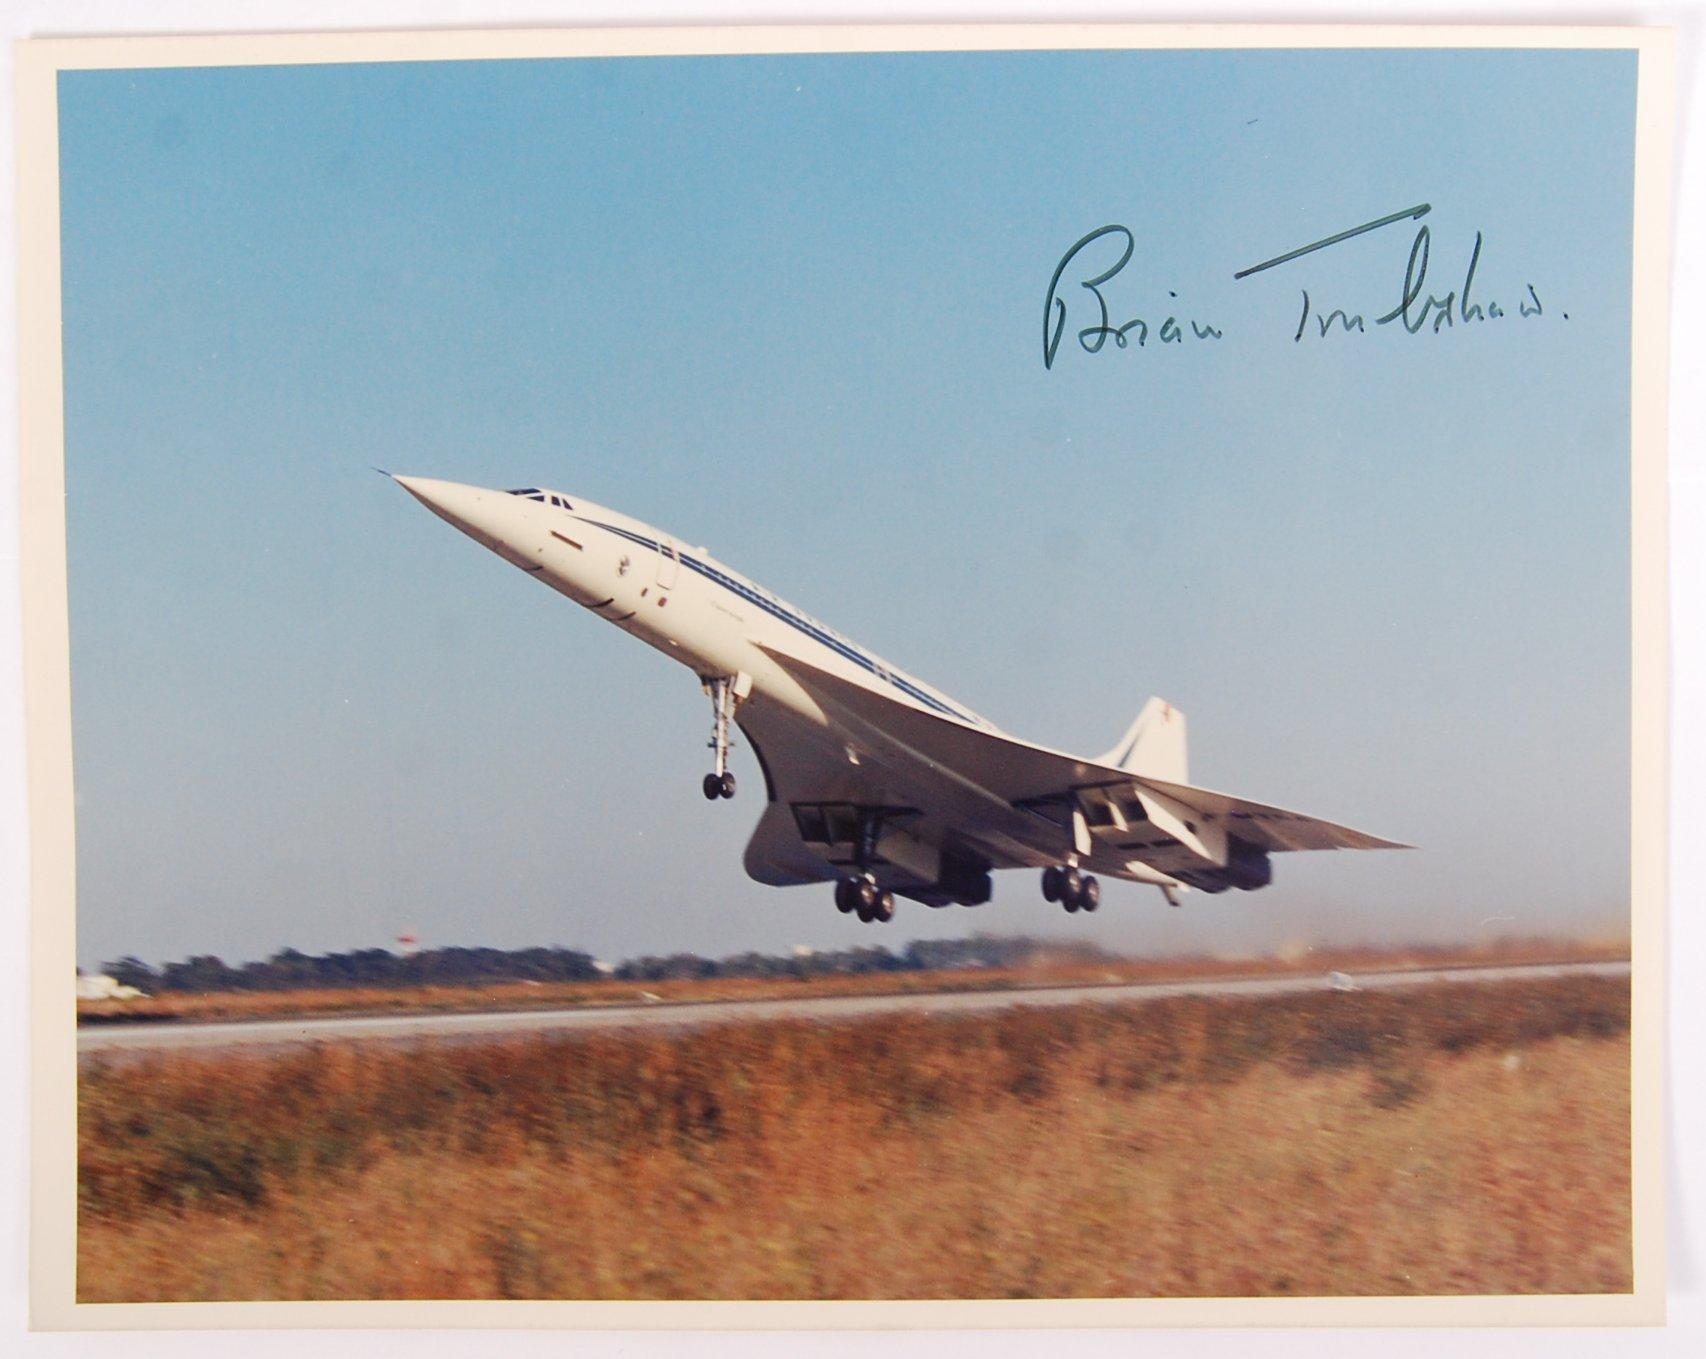 Lot 42 - BRIAN TRUBSHAW - CONCORDE TEST PILOT - SIGNED PUBLICITY PHOTOGRAPH